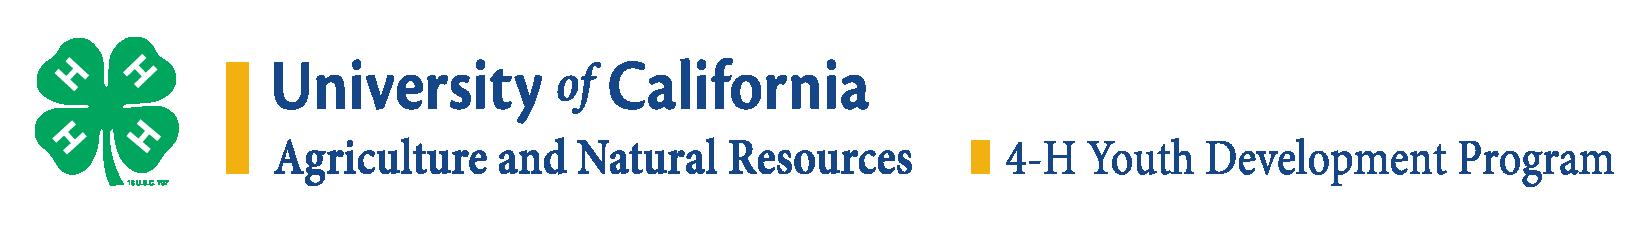 University of Calilifornia 4-H Logo in English